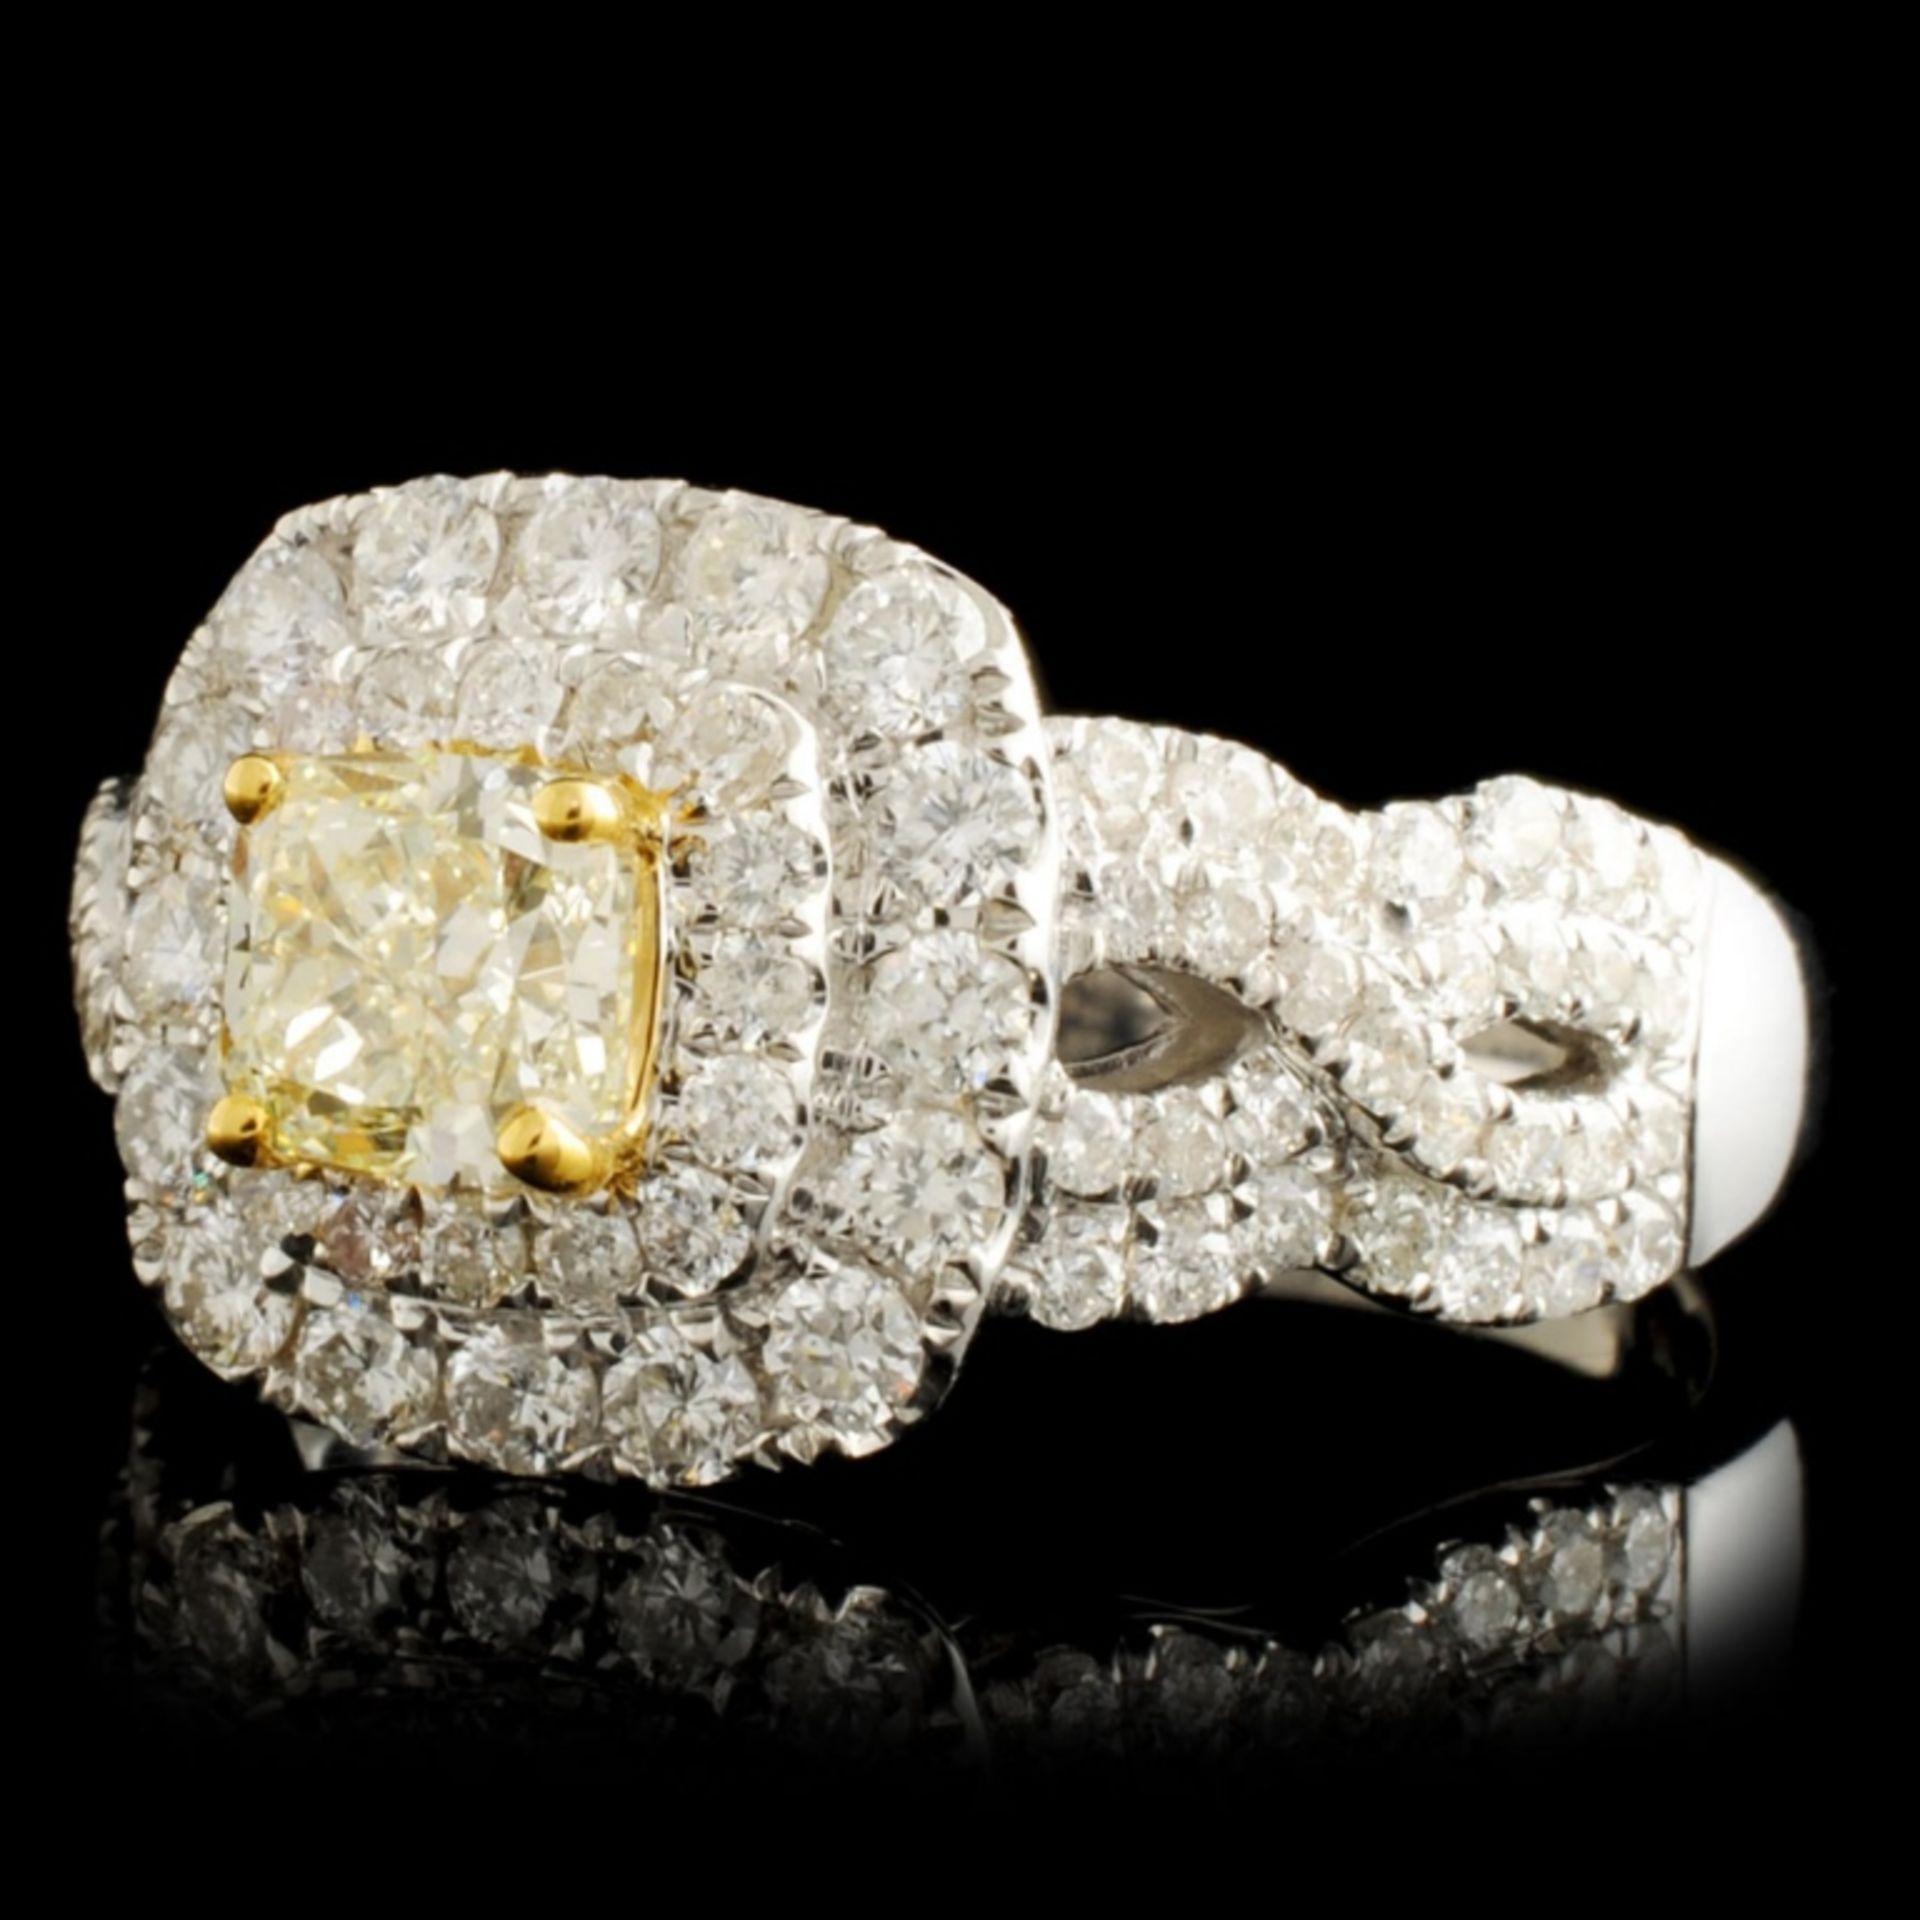 18K Gold 1.52ctw Fancy Diamond Ring - Image 2 of 5